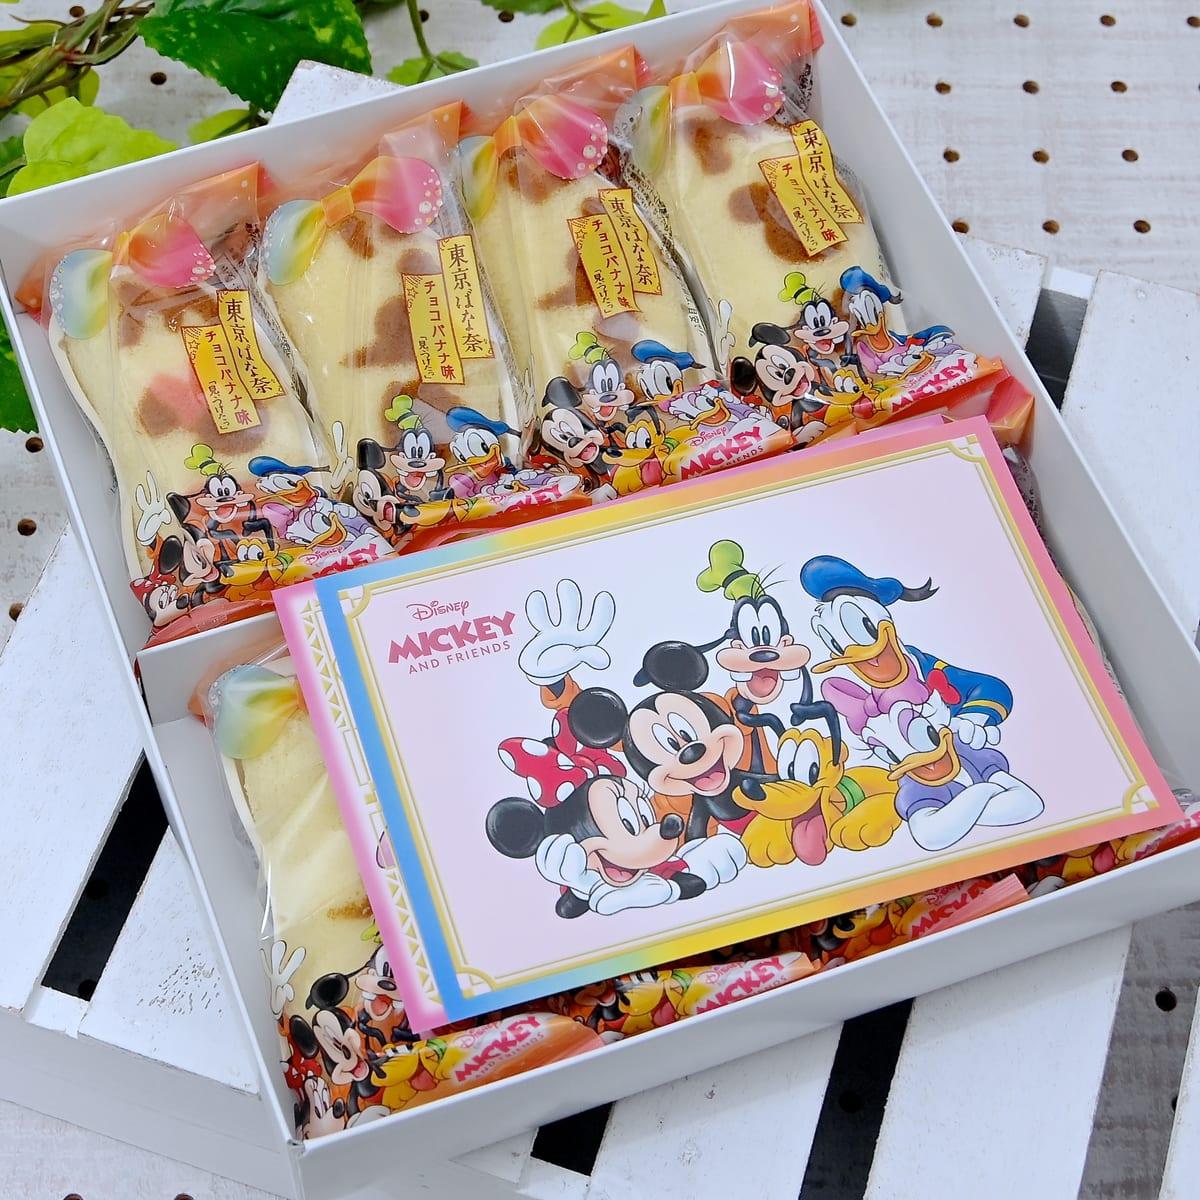 「Disney SWEETS COLLECTION by 東京ばな奈」パッケージ ポストカード